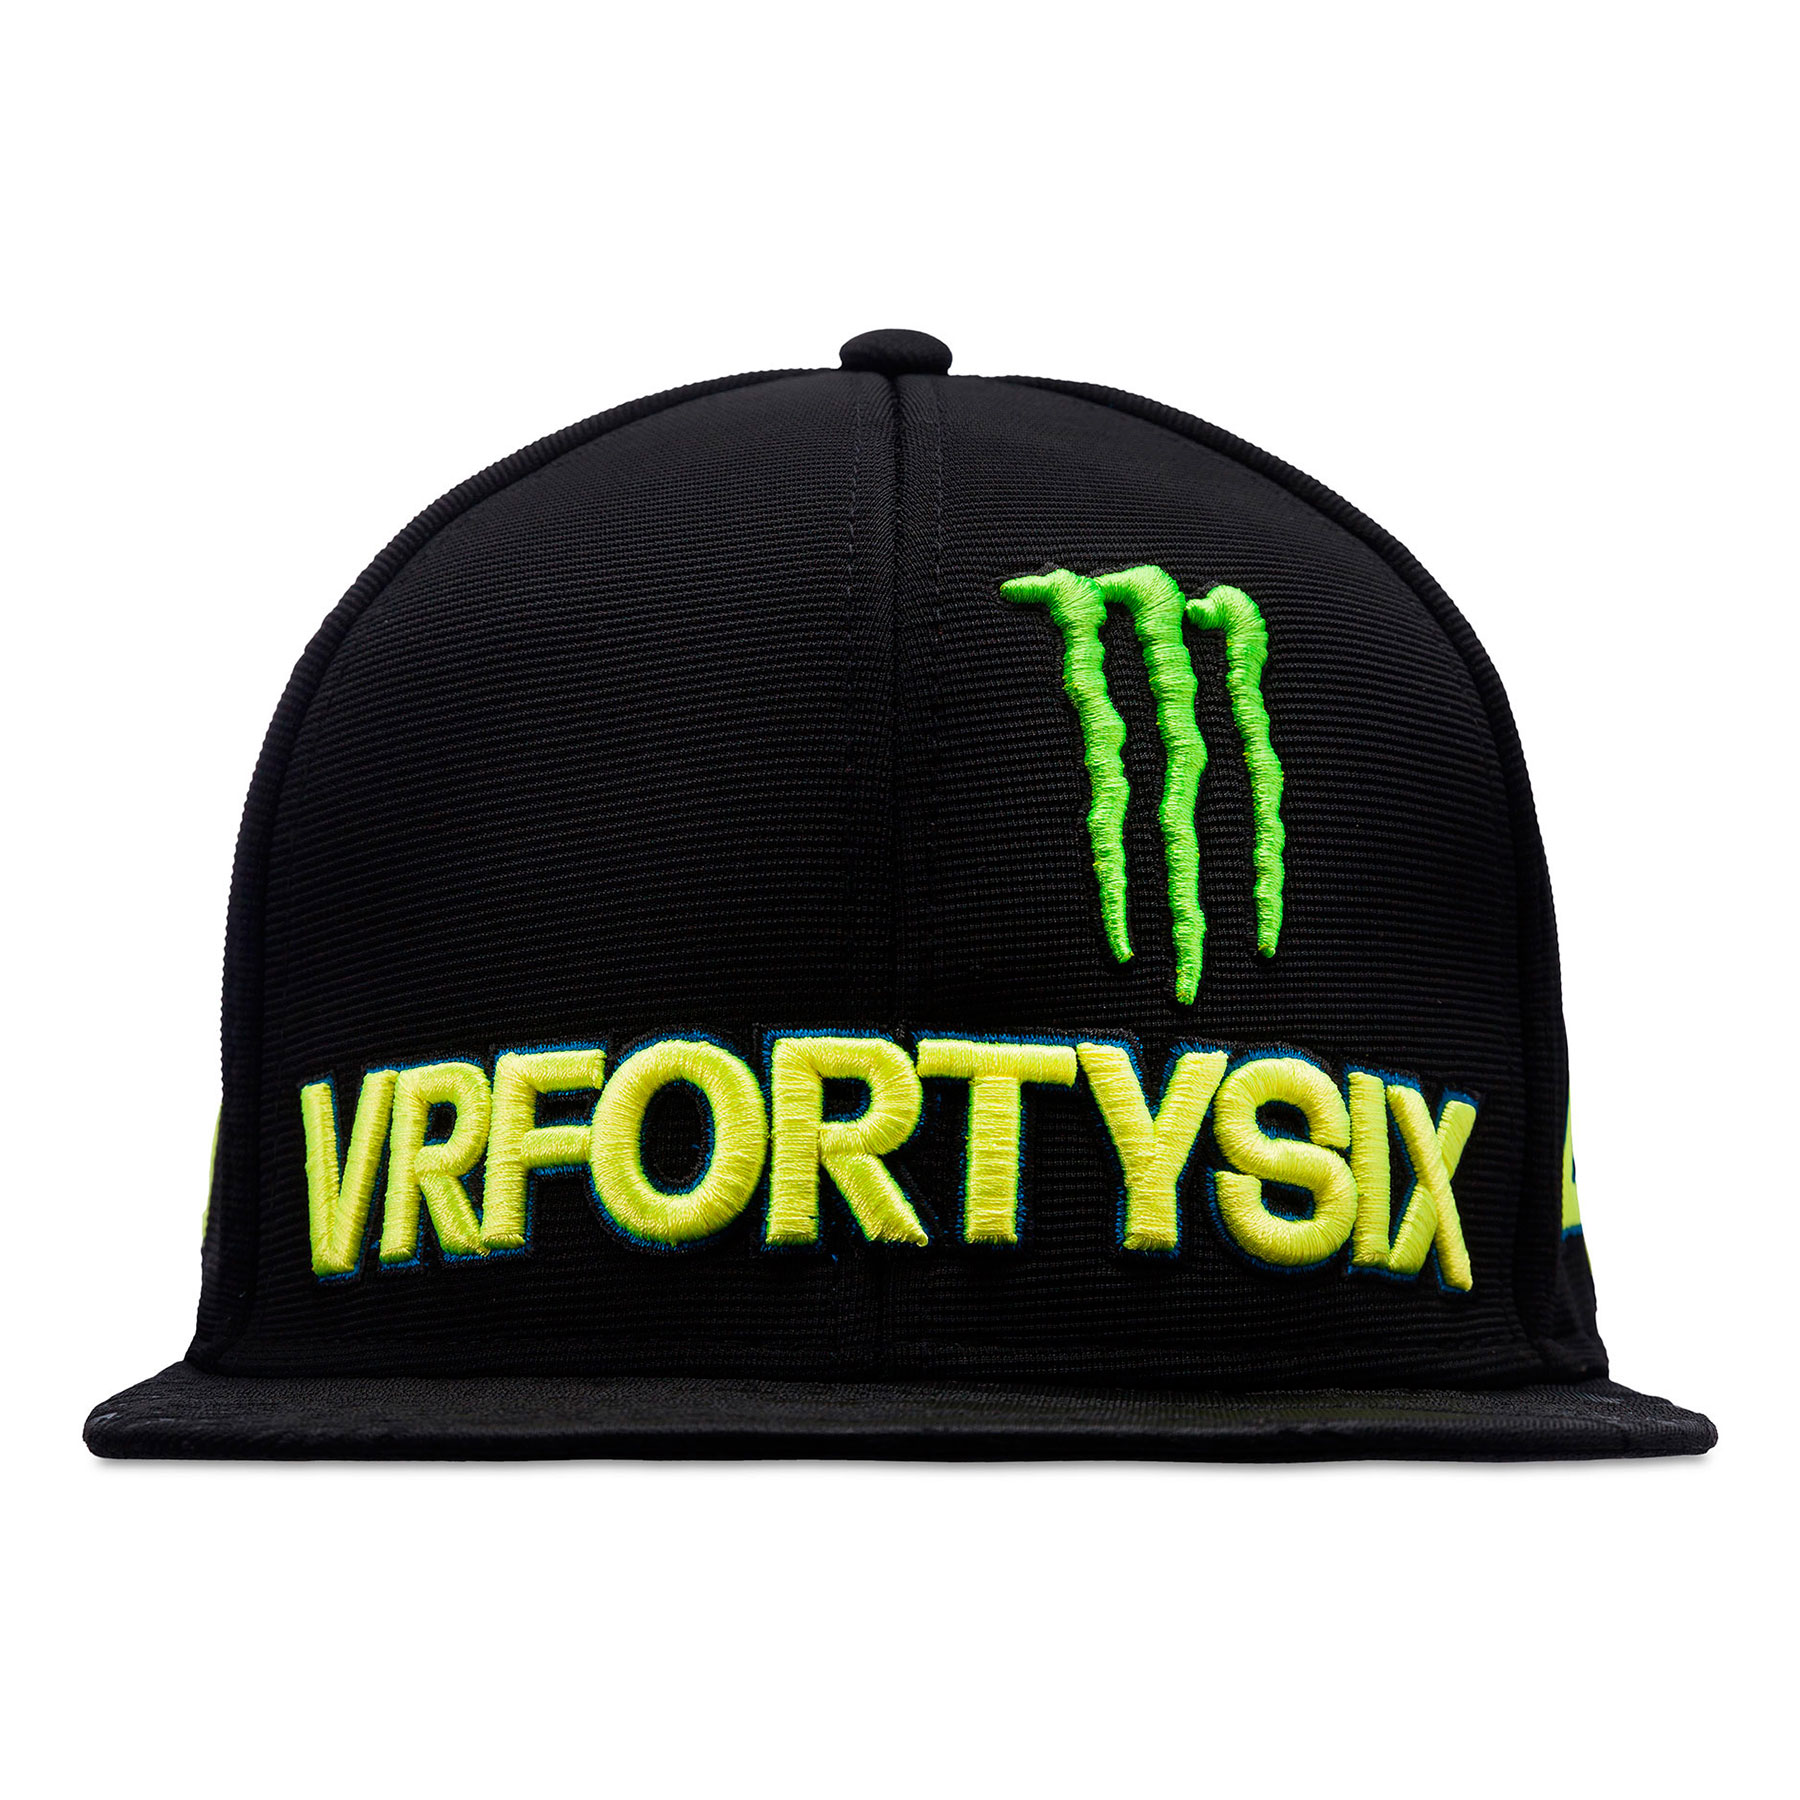 Gorra Valentino Rossi Monster VR46 Negra 2017 en Motorbike Store 85538d49ea5